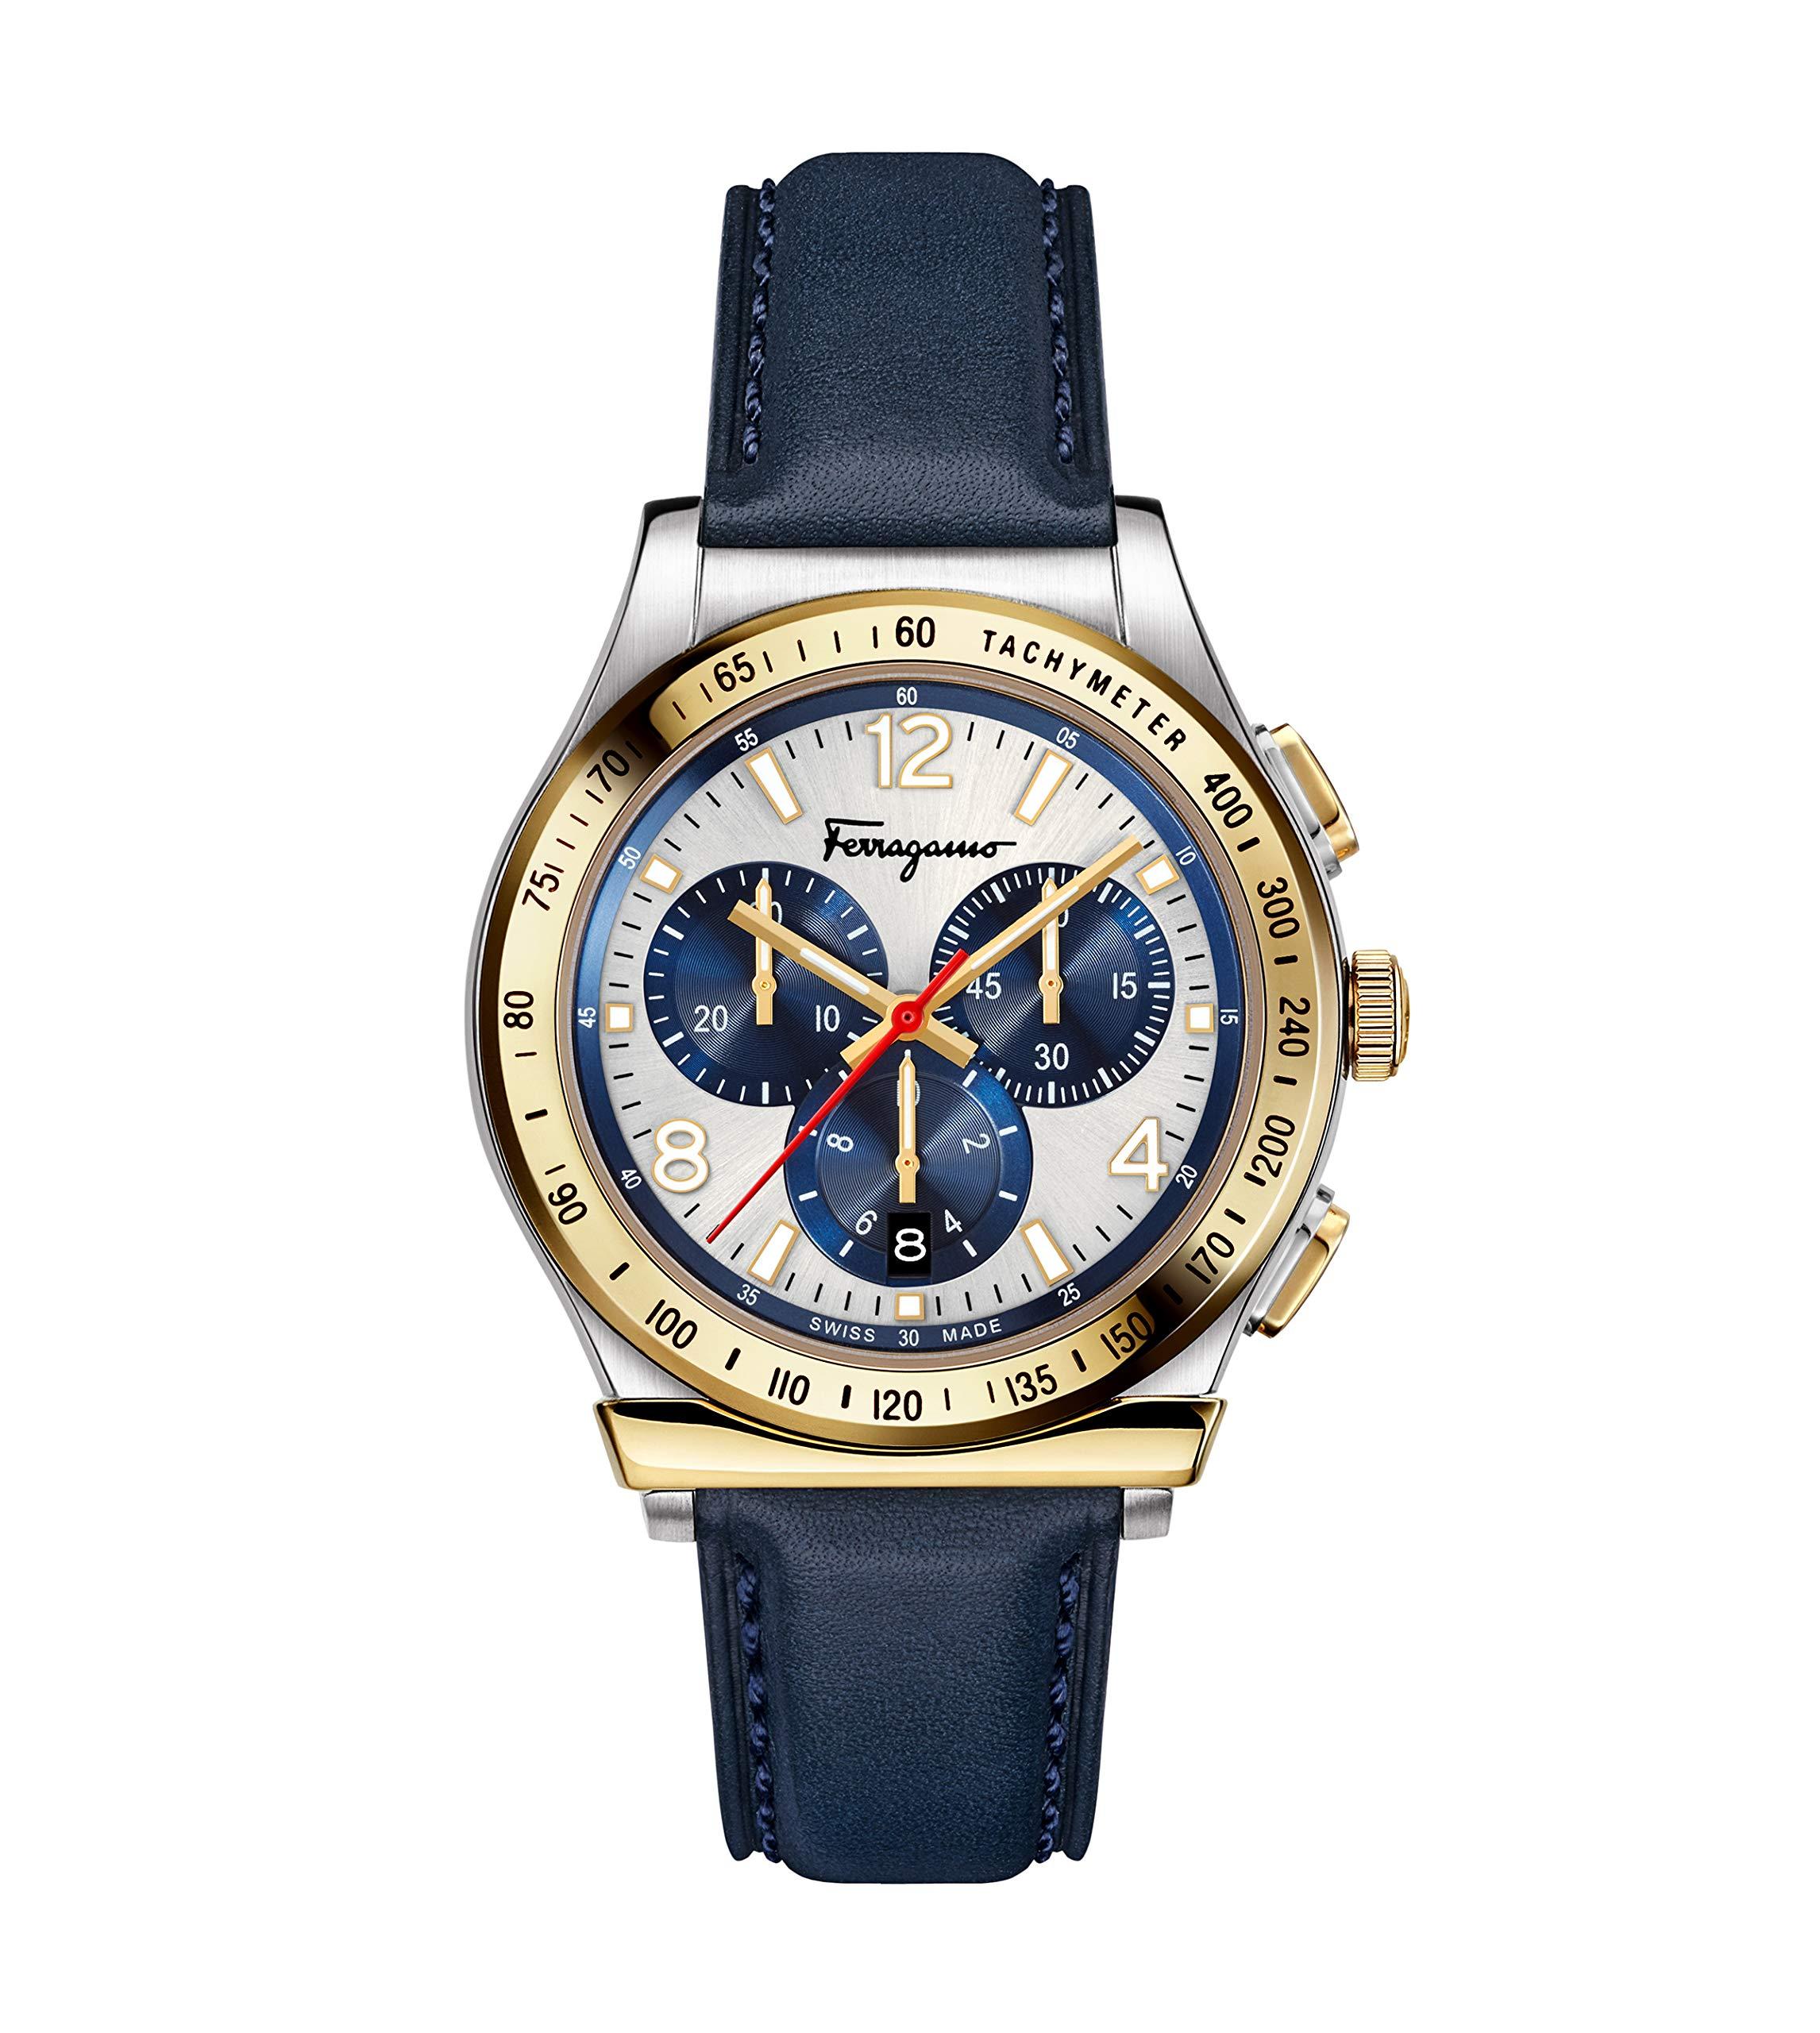 Salvatore Ferragamo Men's Ferragamo 1898 Stainless Steel Quartz Watch with Leather Calfskin Strap, Blue, 20 (Model: SFDK00218